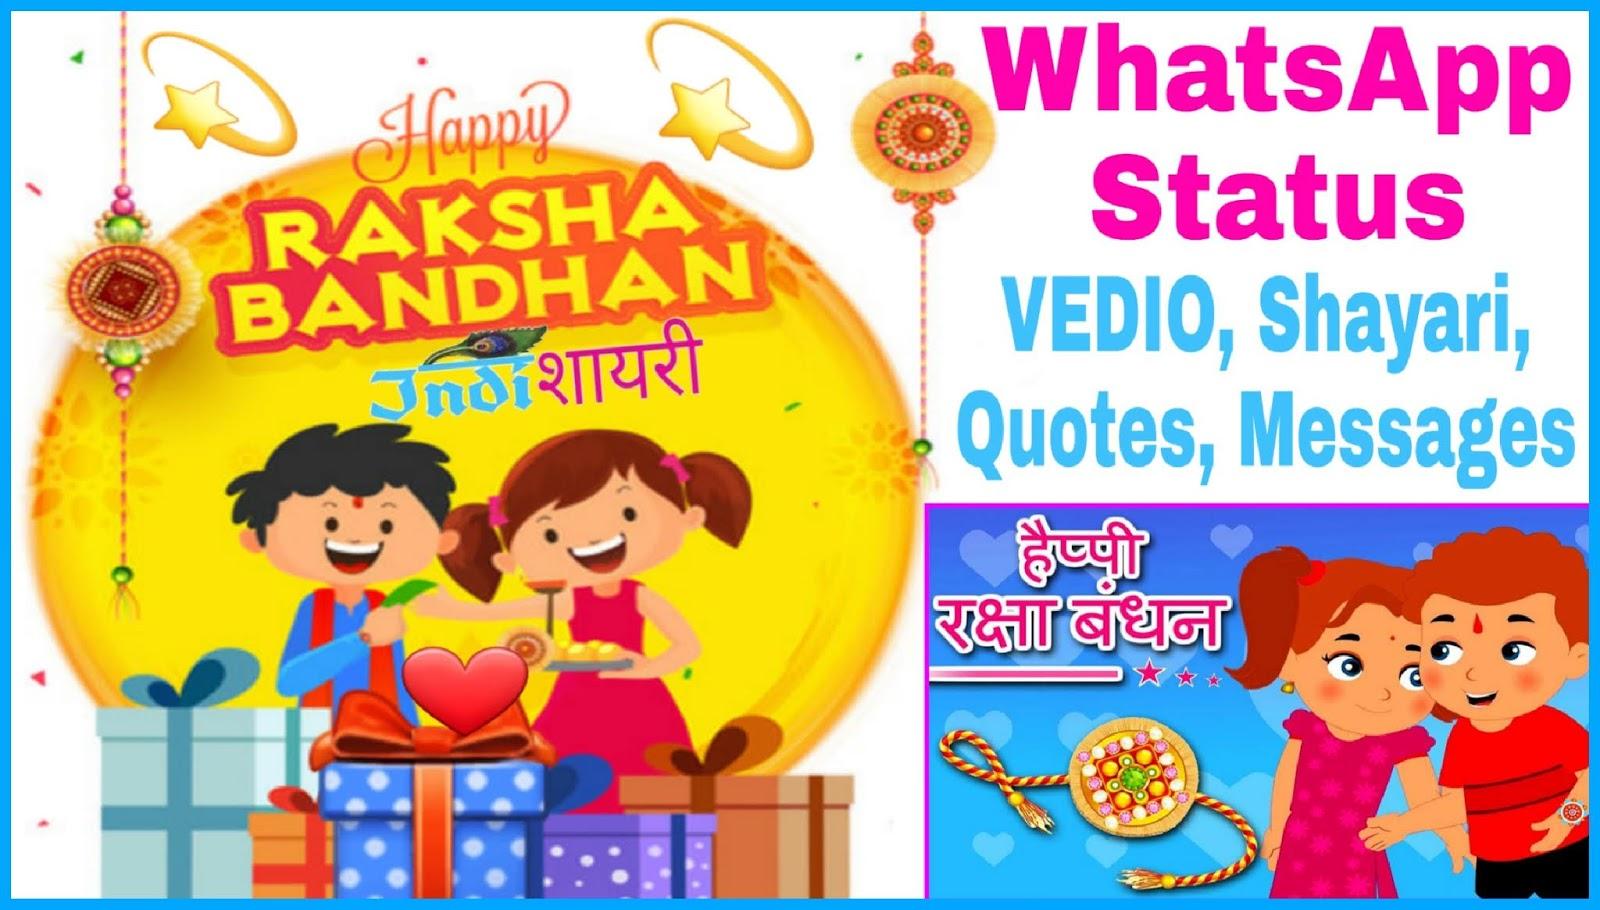 Raksha Bandhan Whatsapp Video Status Shayari Quotes